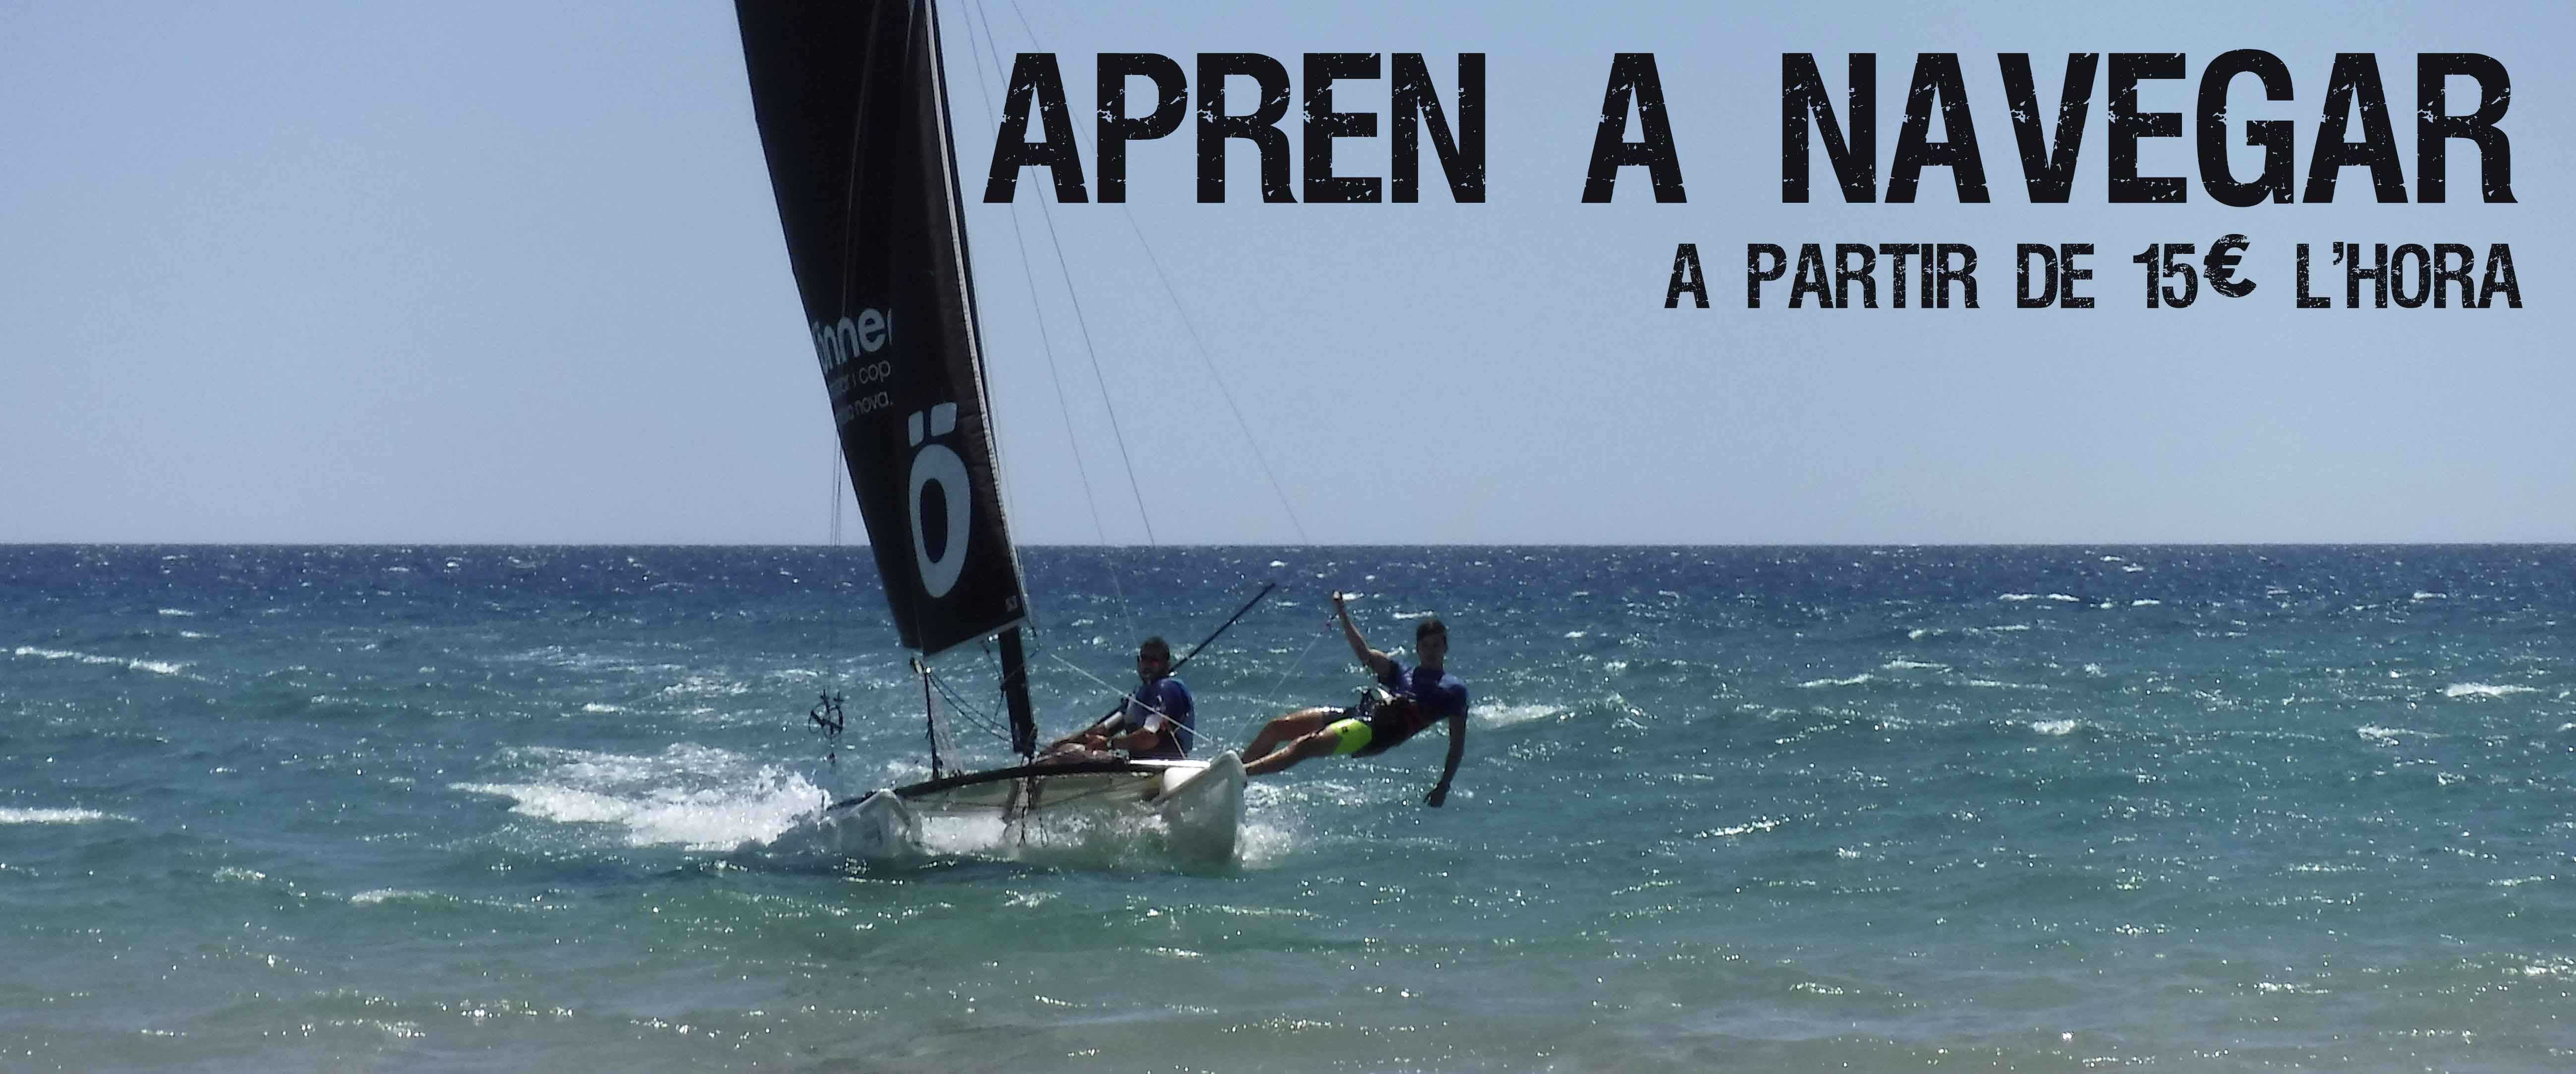 aprendre navegar tarragona